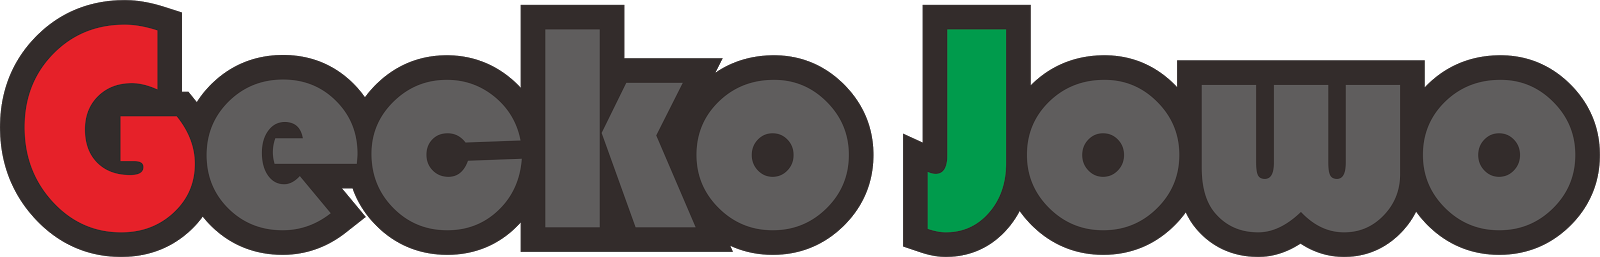 Gecko Jowo